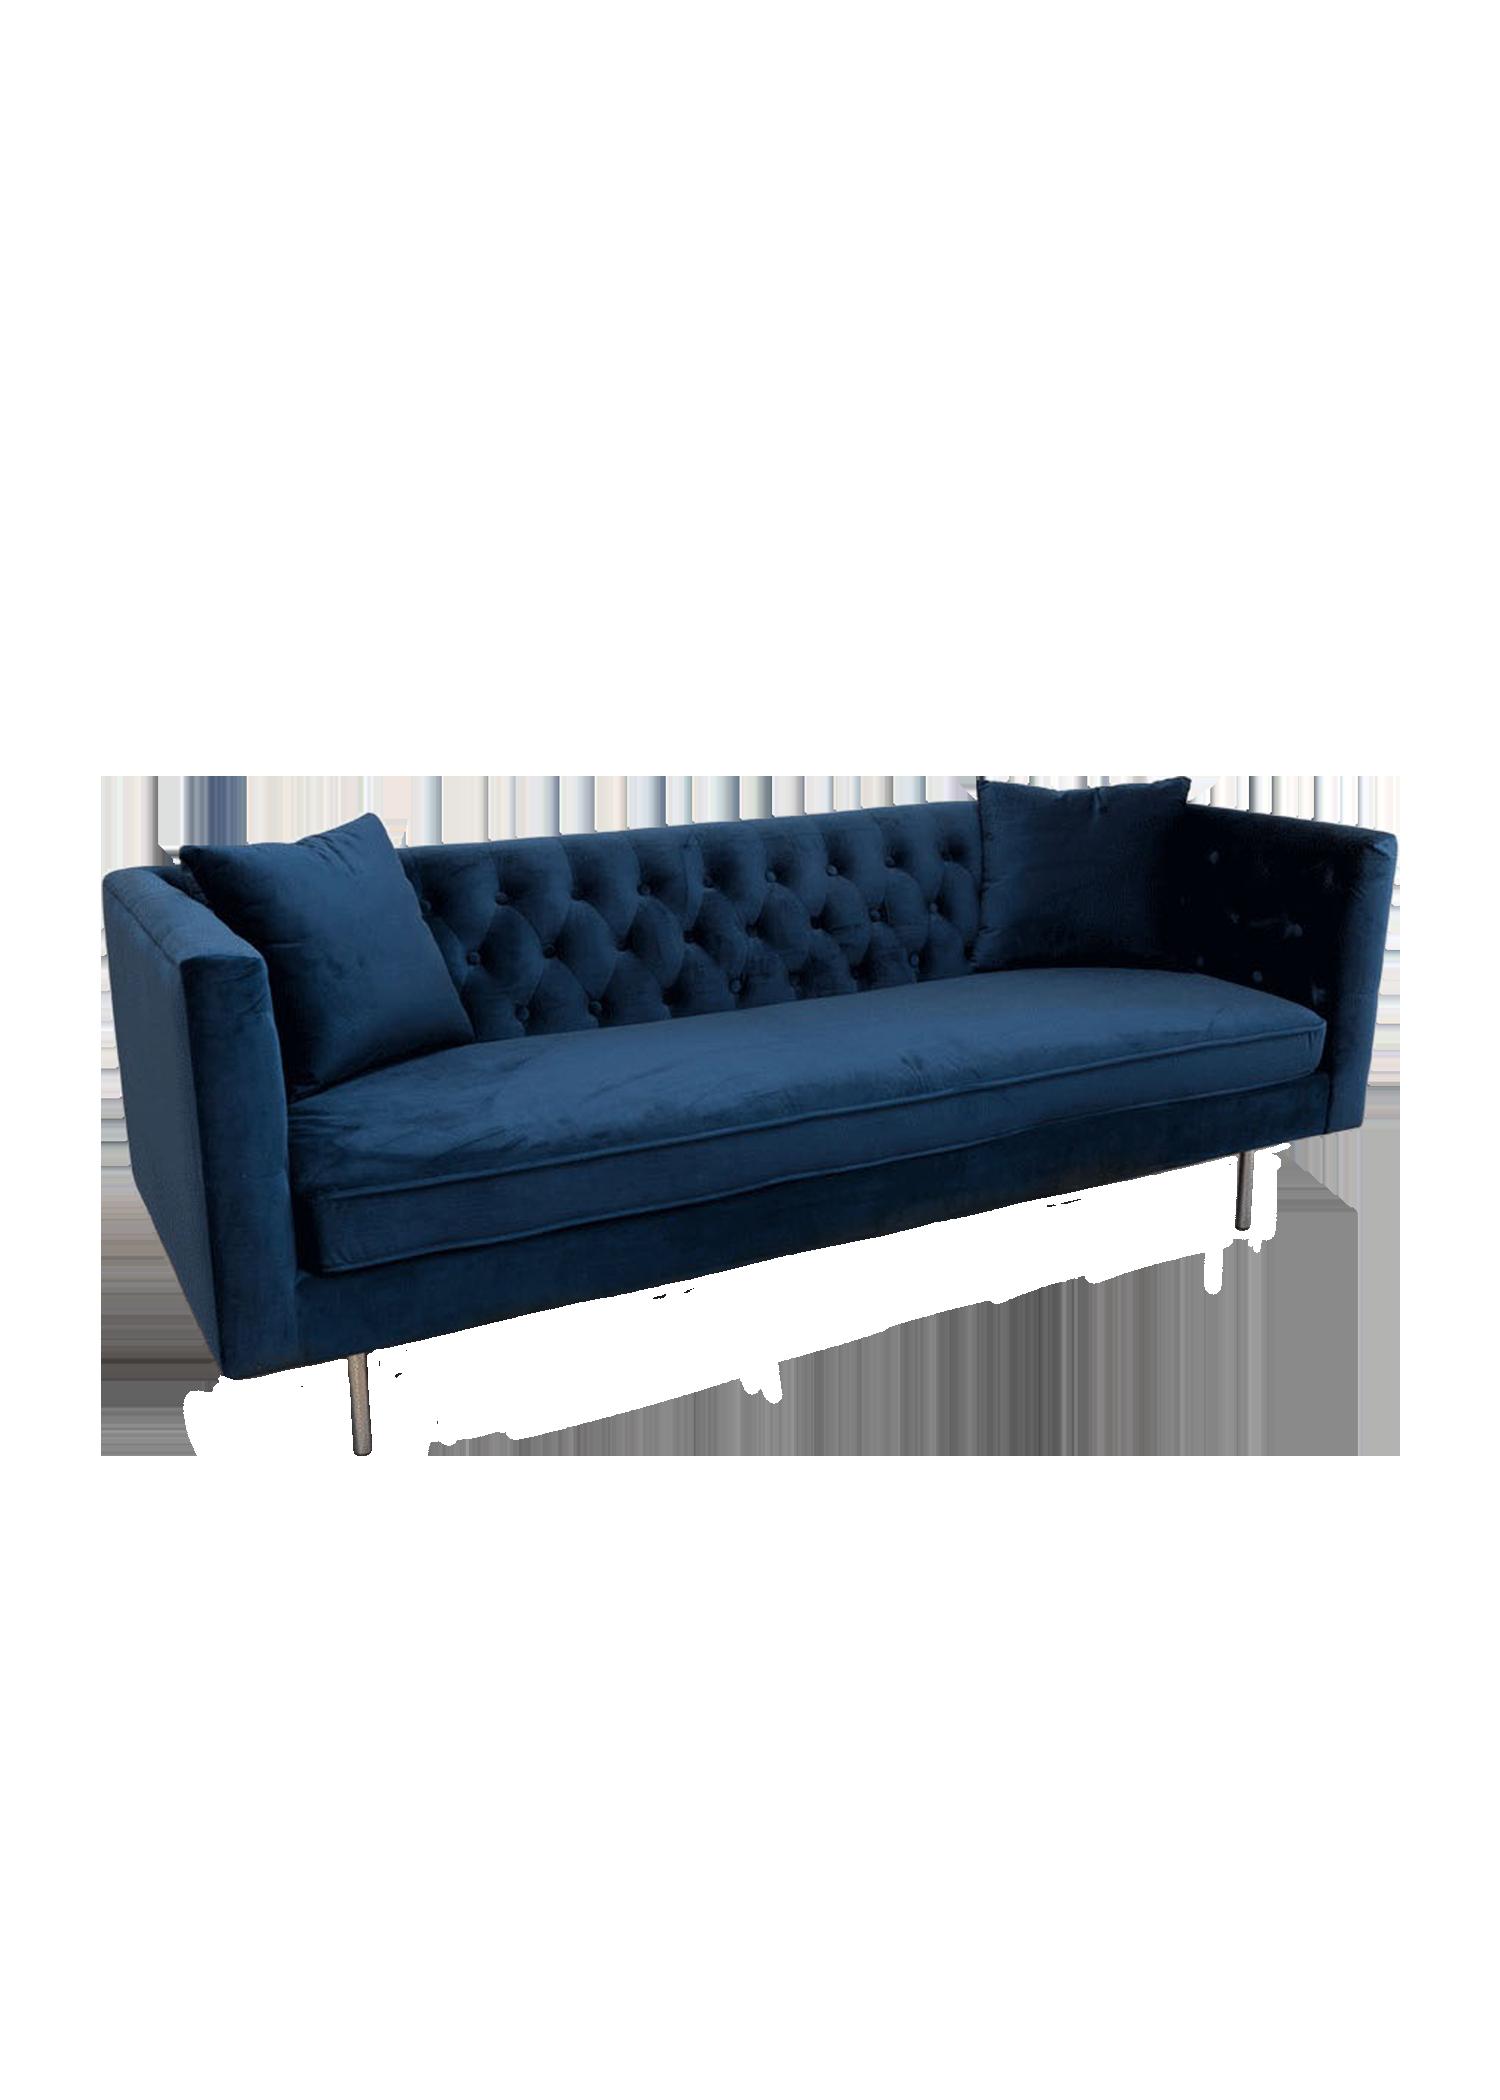 $200 Corinne Sofa